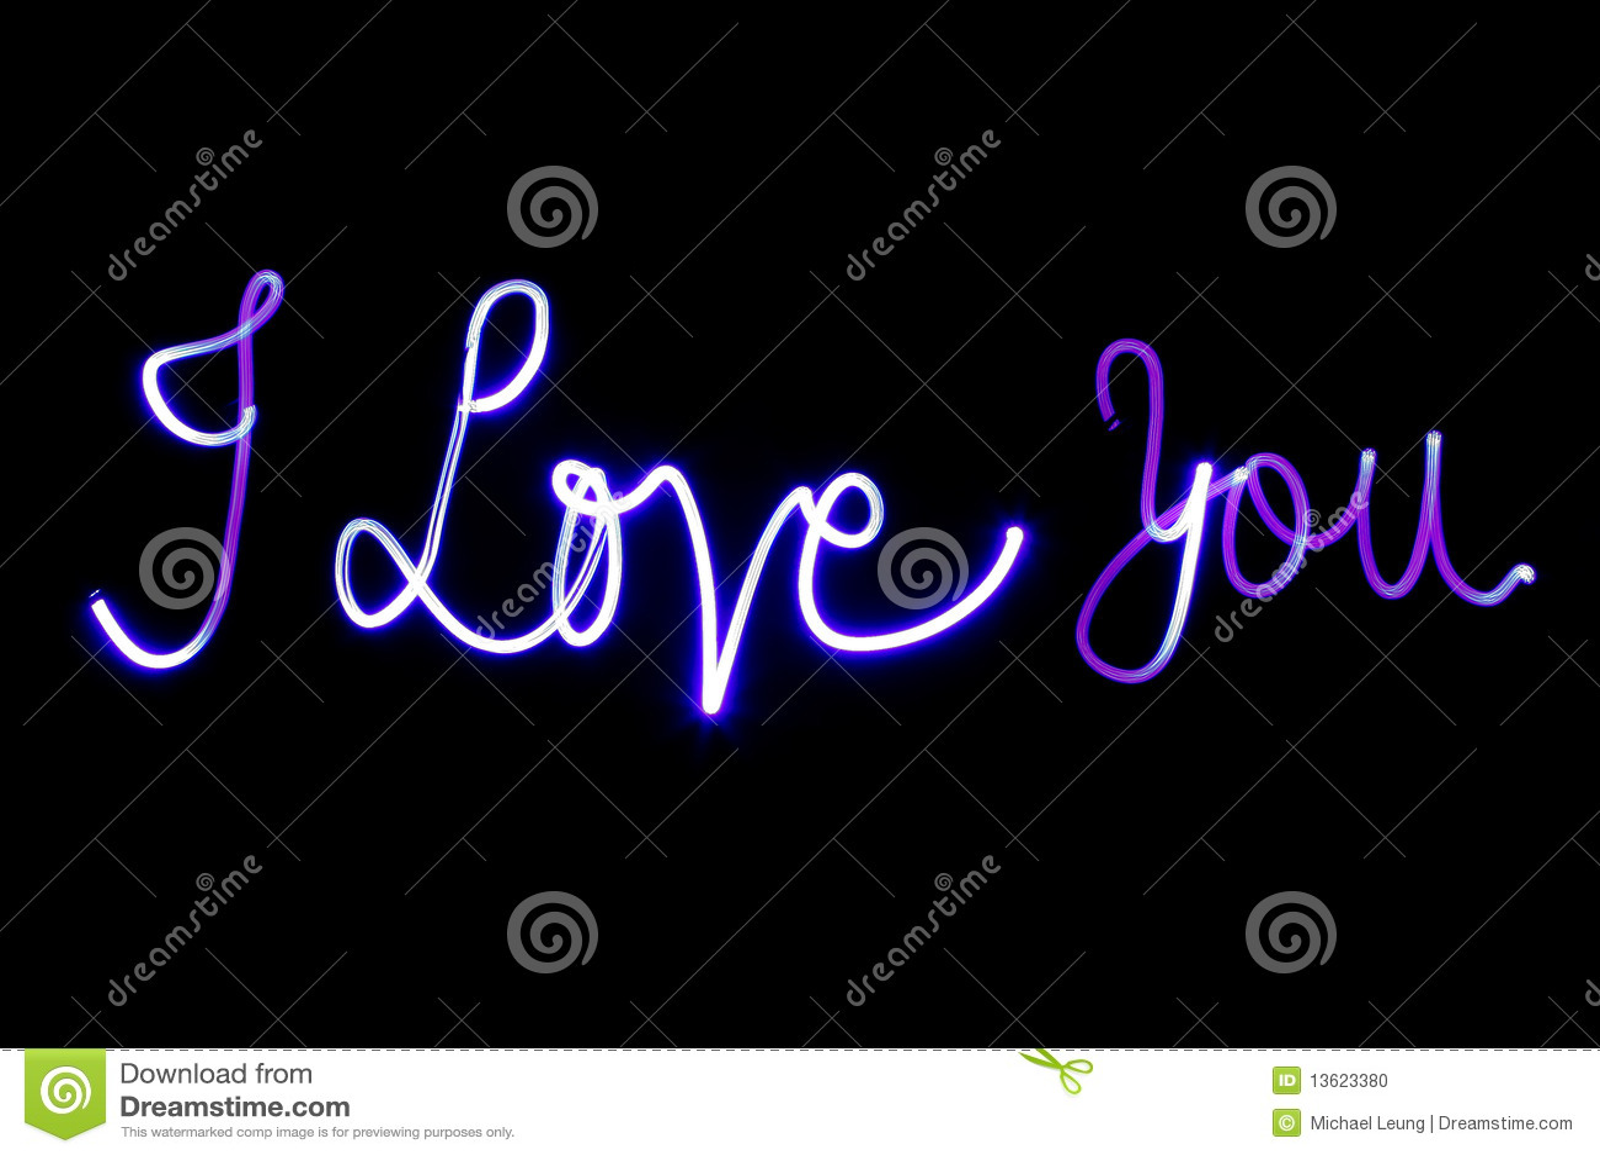 I Love You Stock Photo Image Of Handwritten Word